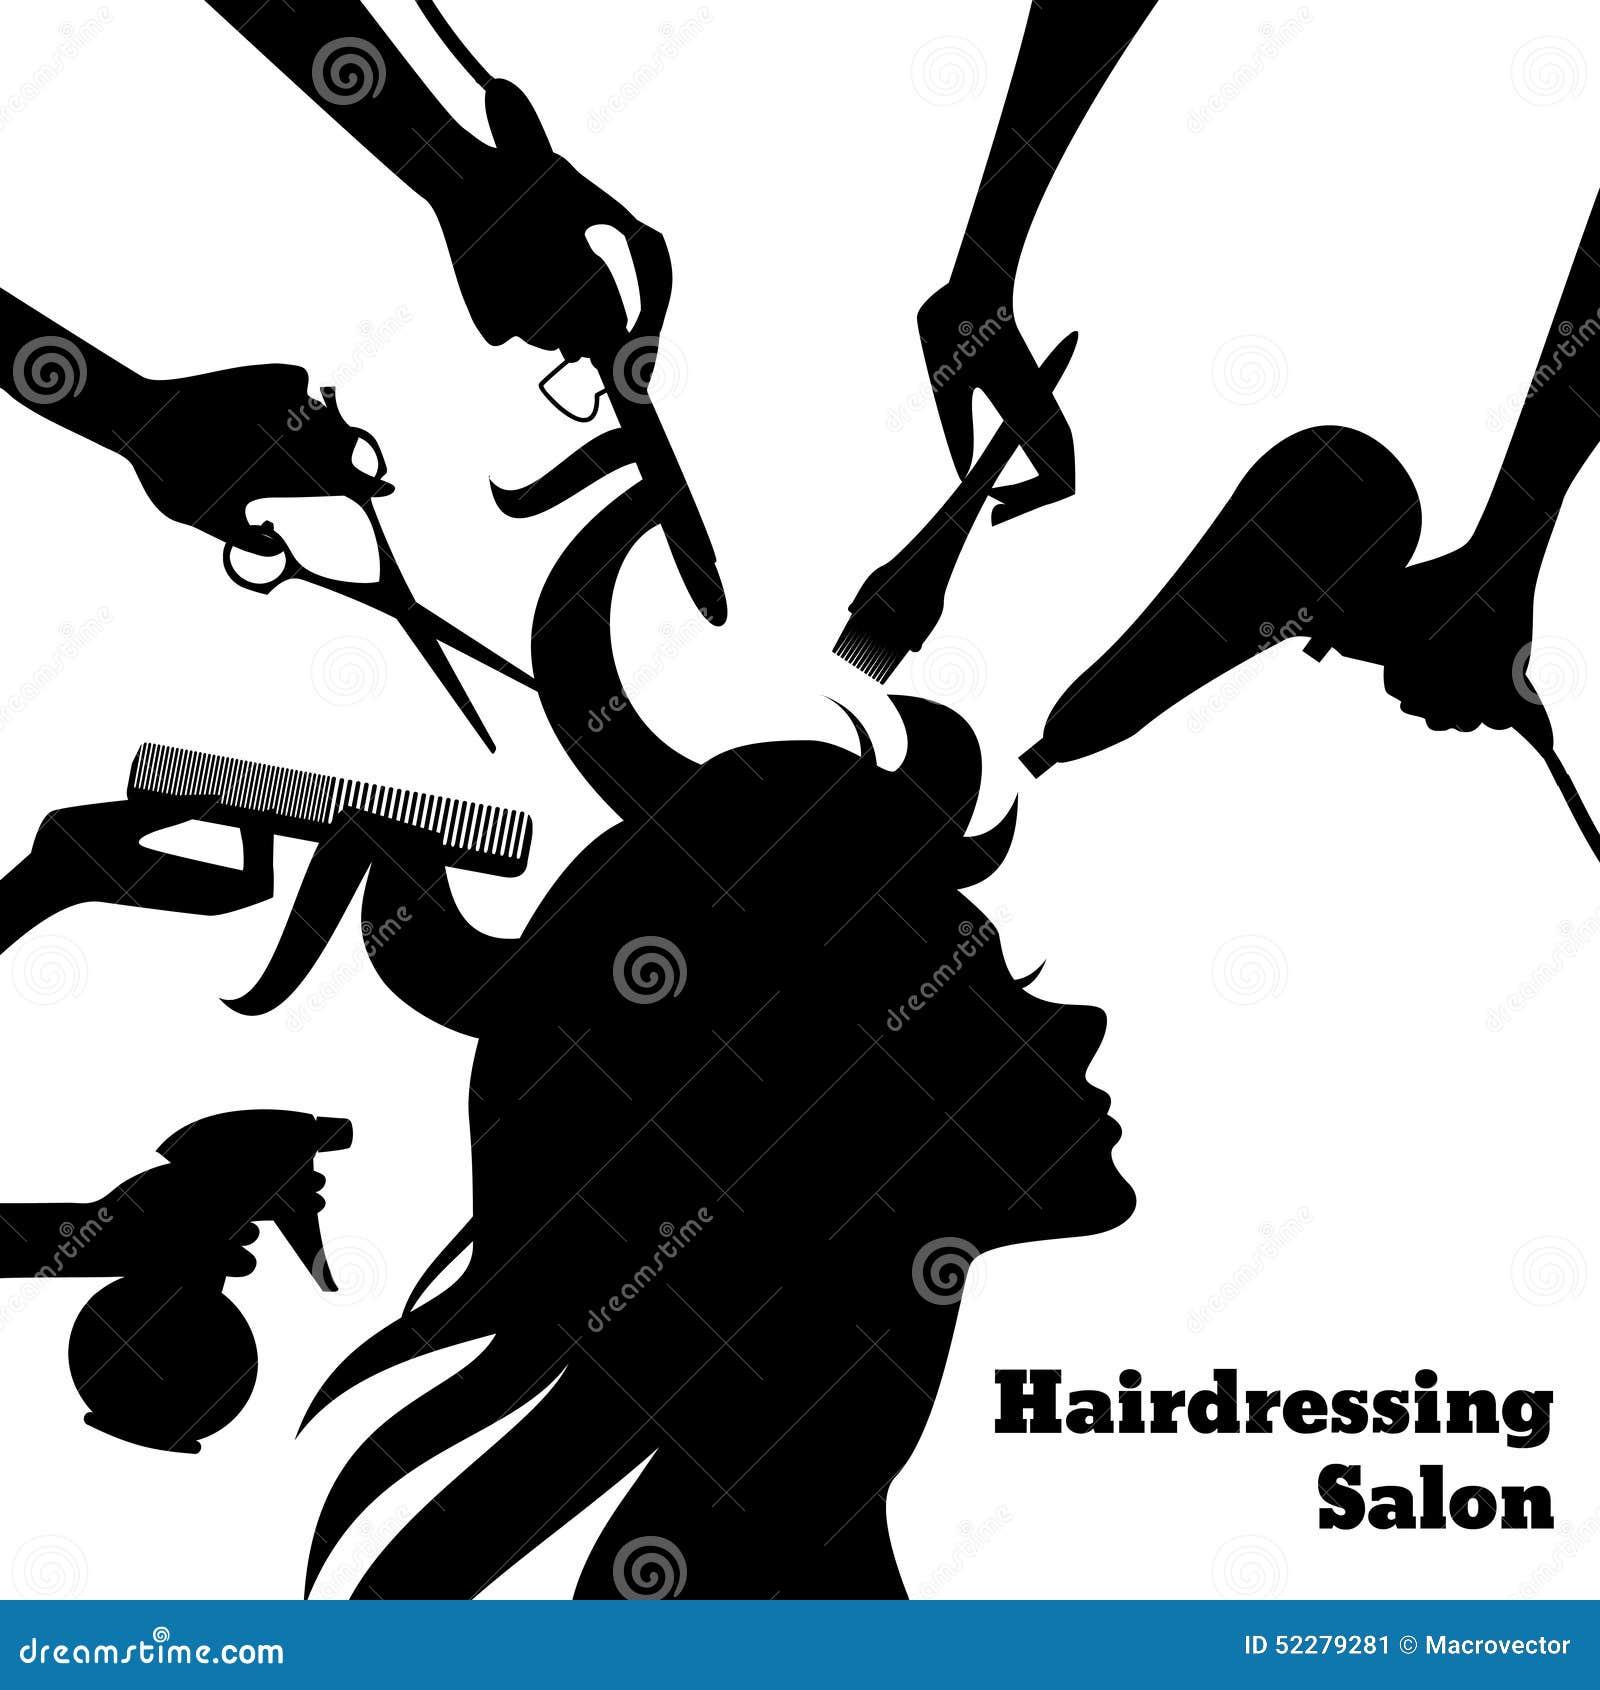 Beauty salon concept stock vector illustration of girl for Accessoires de salon